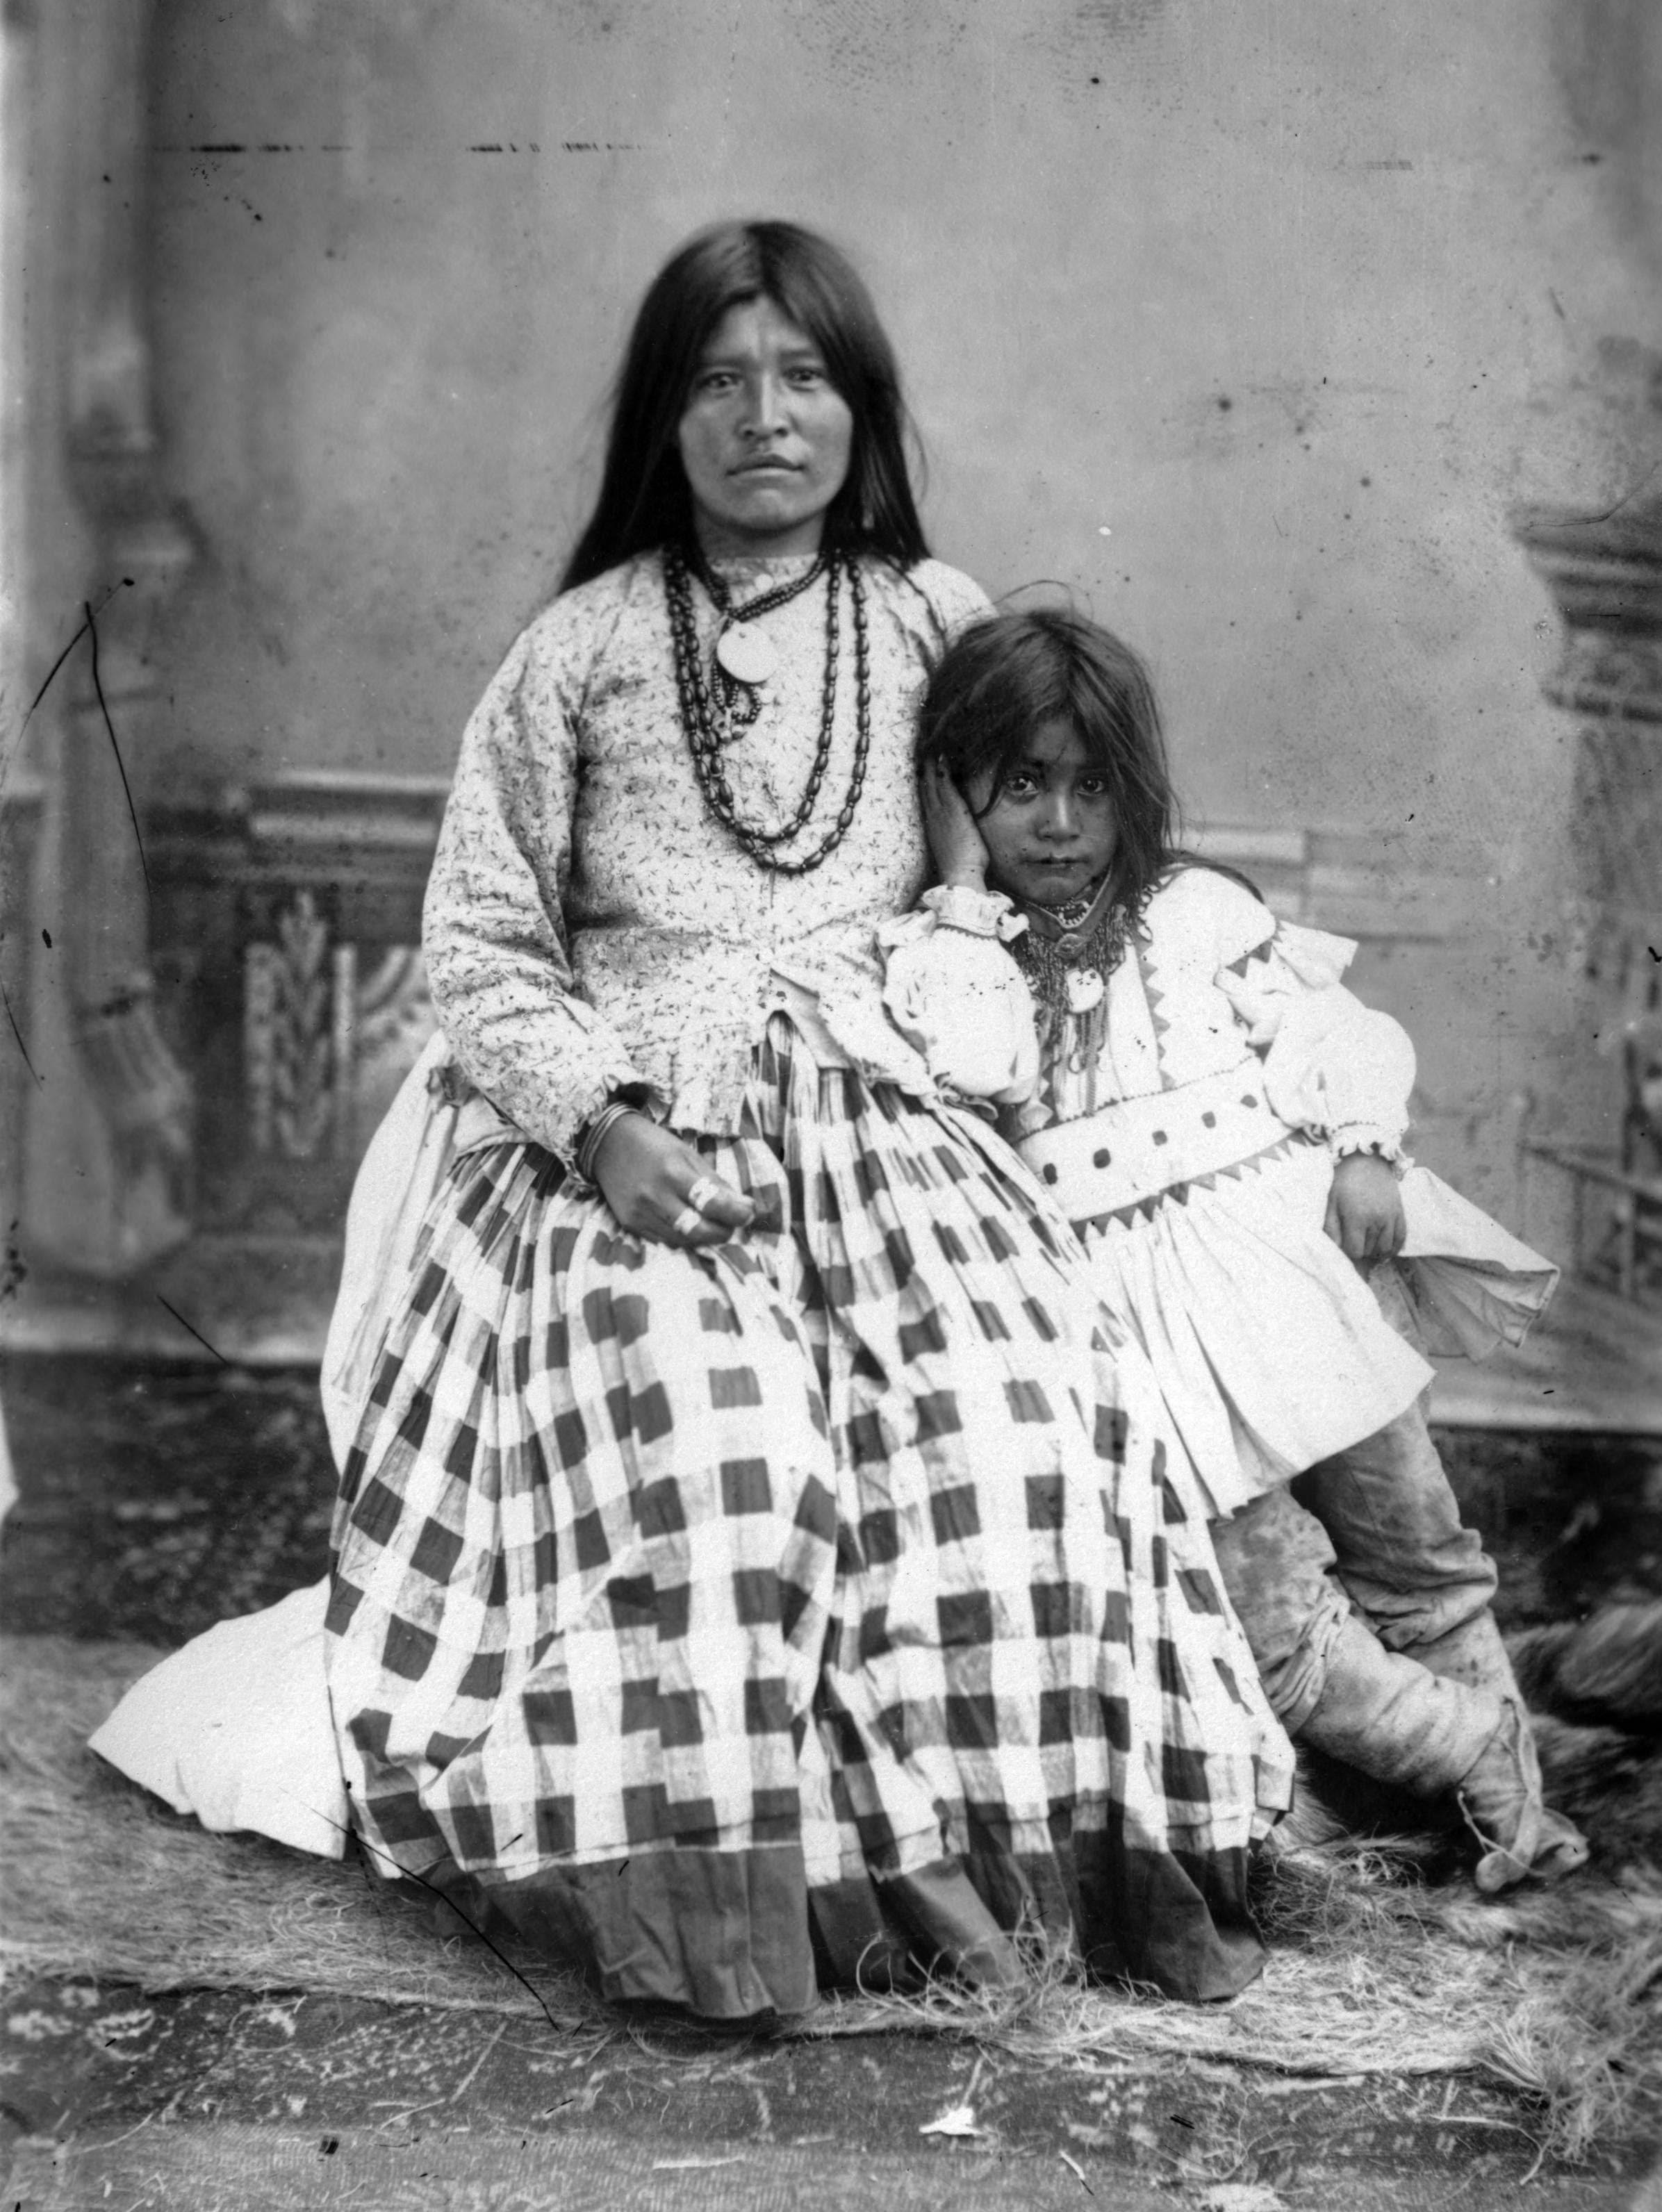 File:Ta-ayz-slath, wife of Geronimo, and one child.jpg